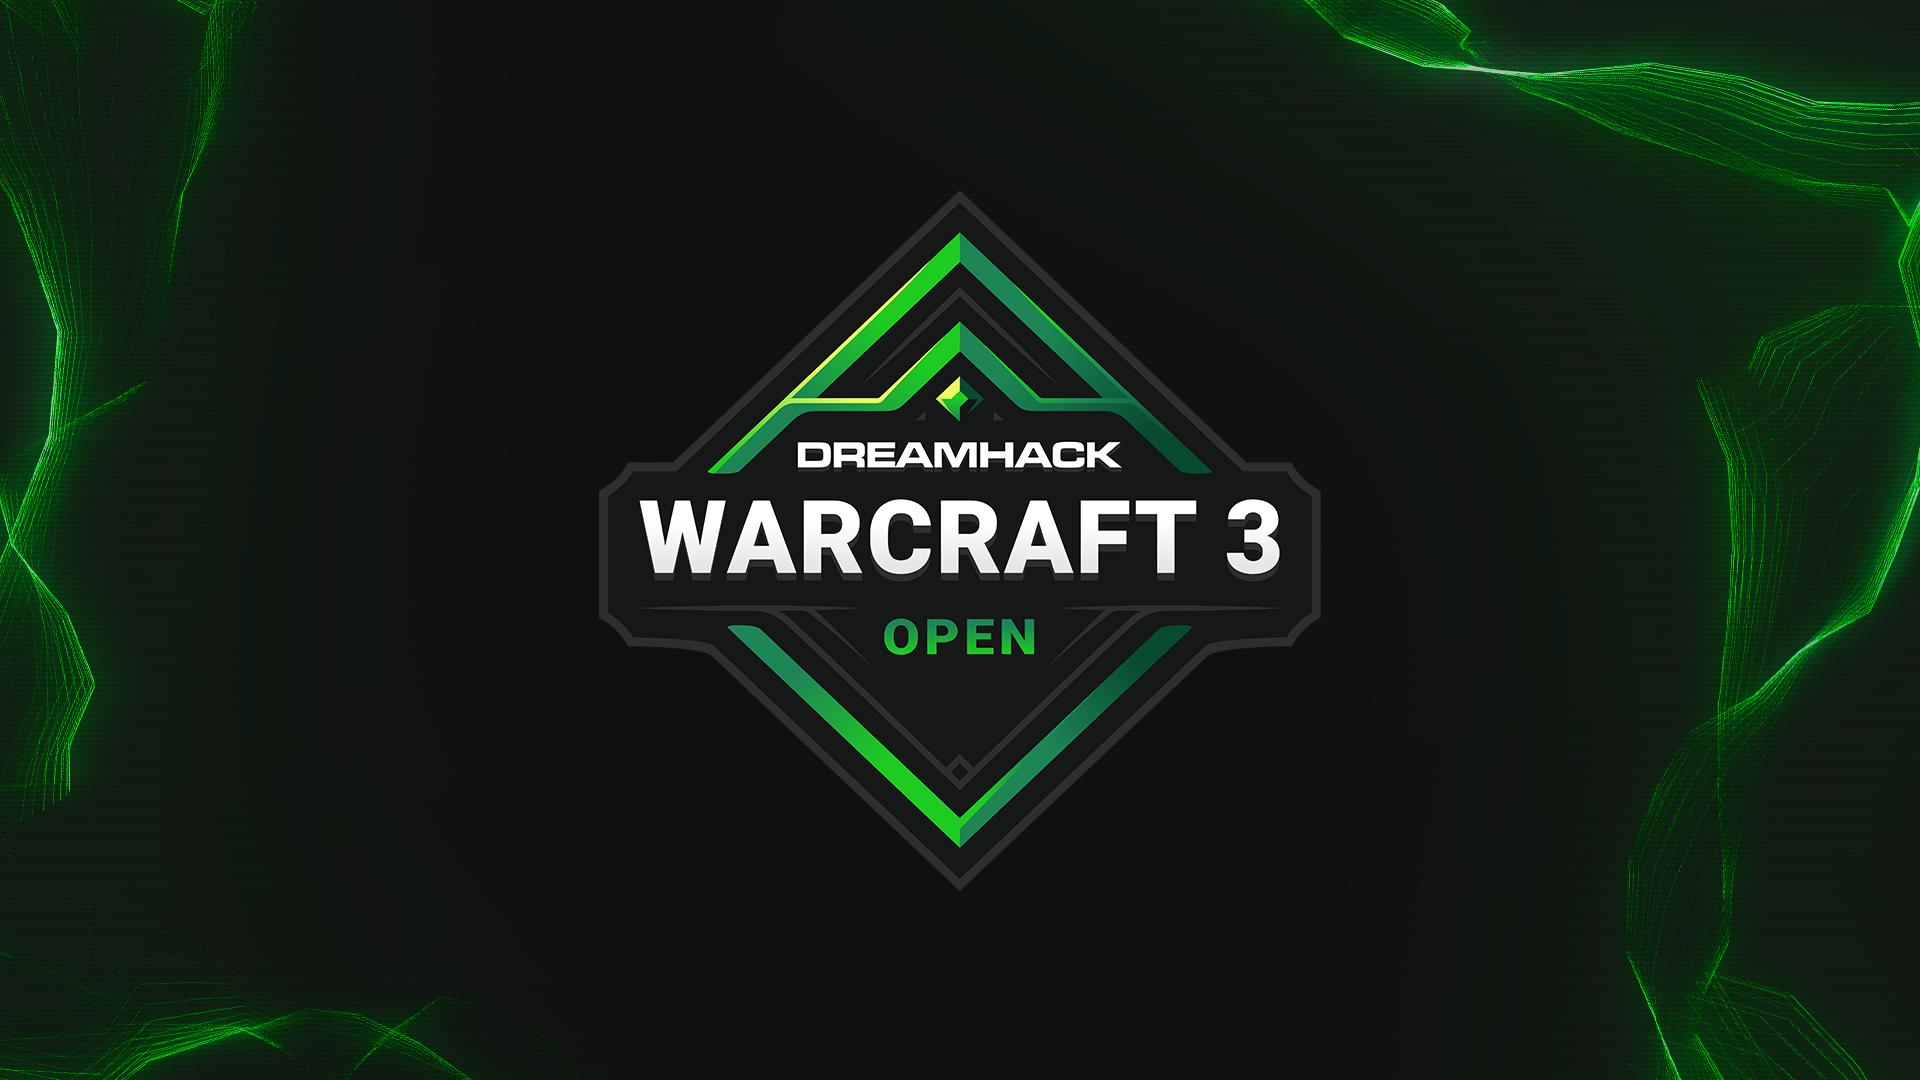 Чан «Moon» Джэ Хо, Блоги, Дмитрий «Happy» Костин, Warcraft 3: Reforged, Blizzard Entertainment